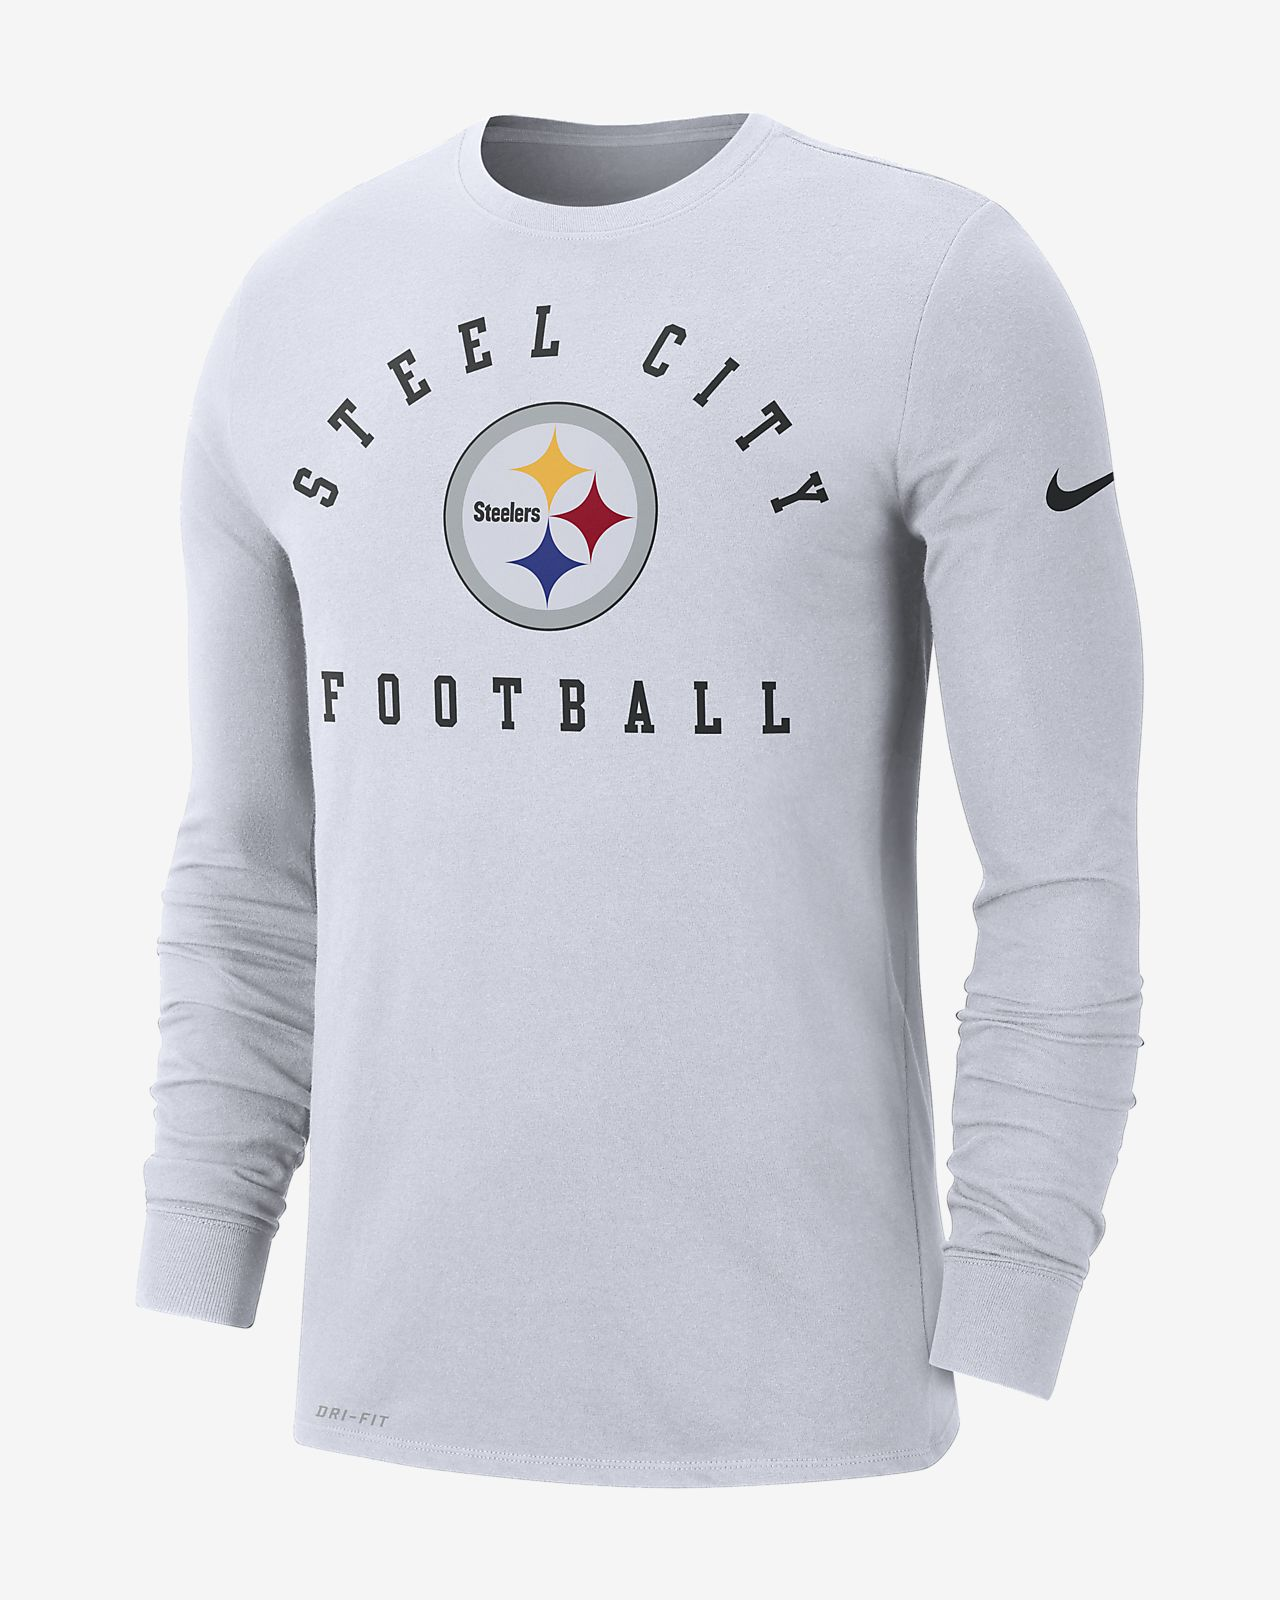 Nike Sideline Local (NFL Steelers) Men's Long-Sleeve T-Shirt